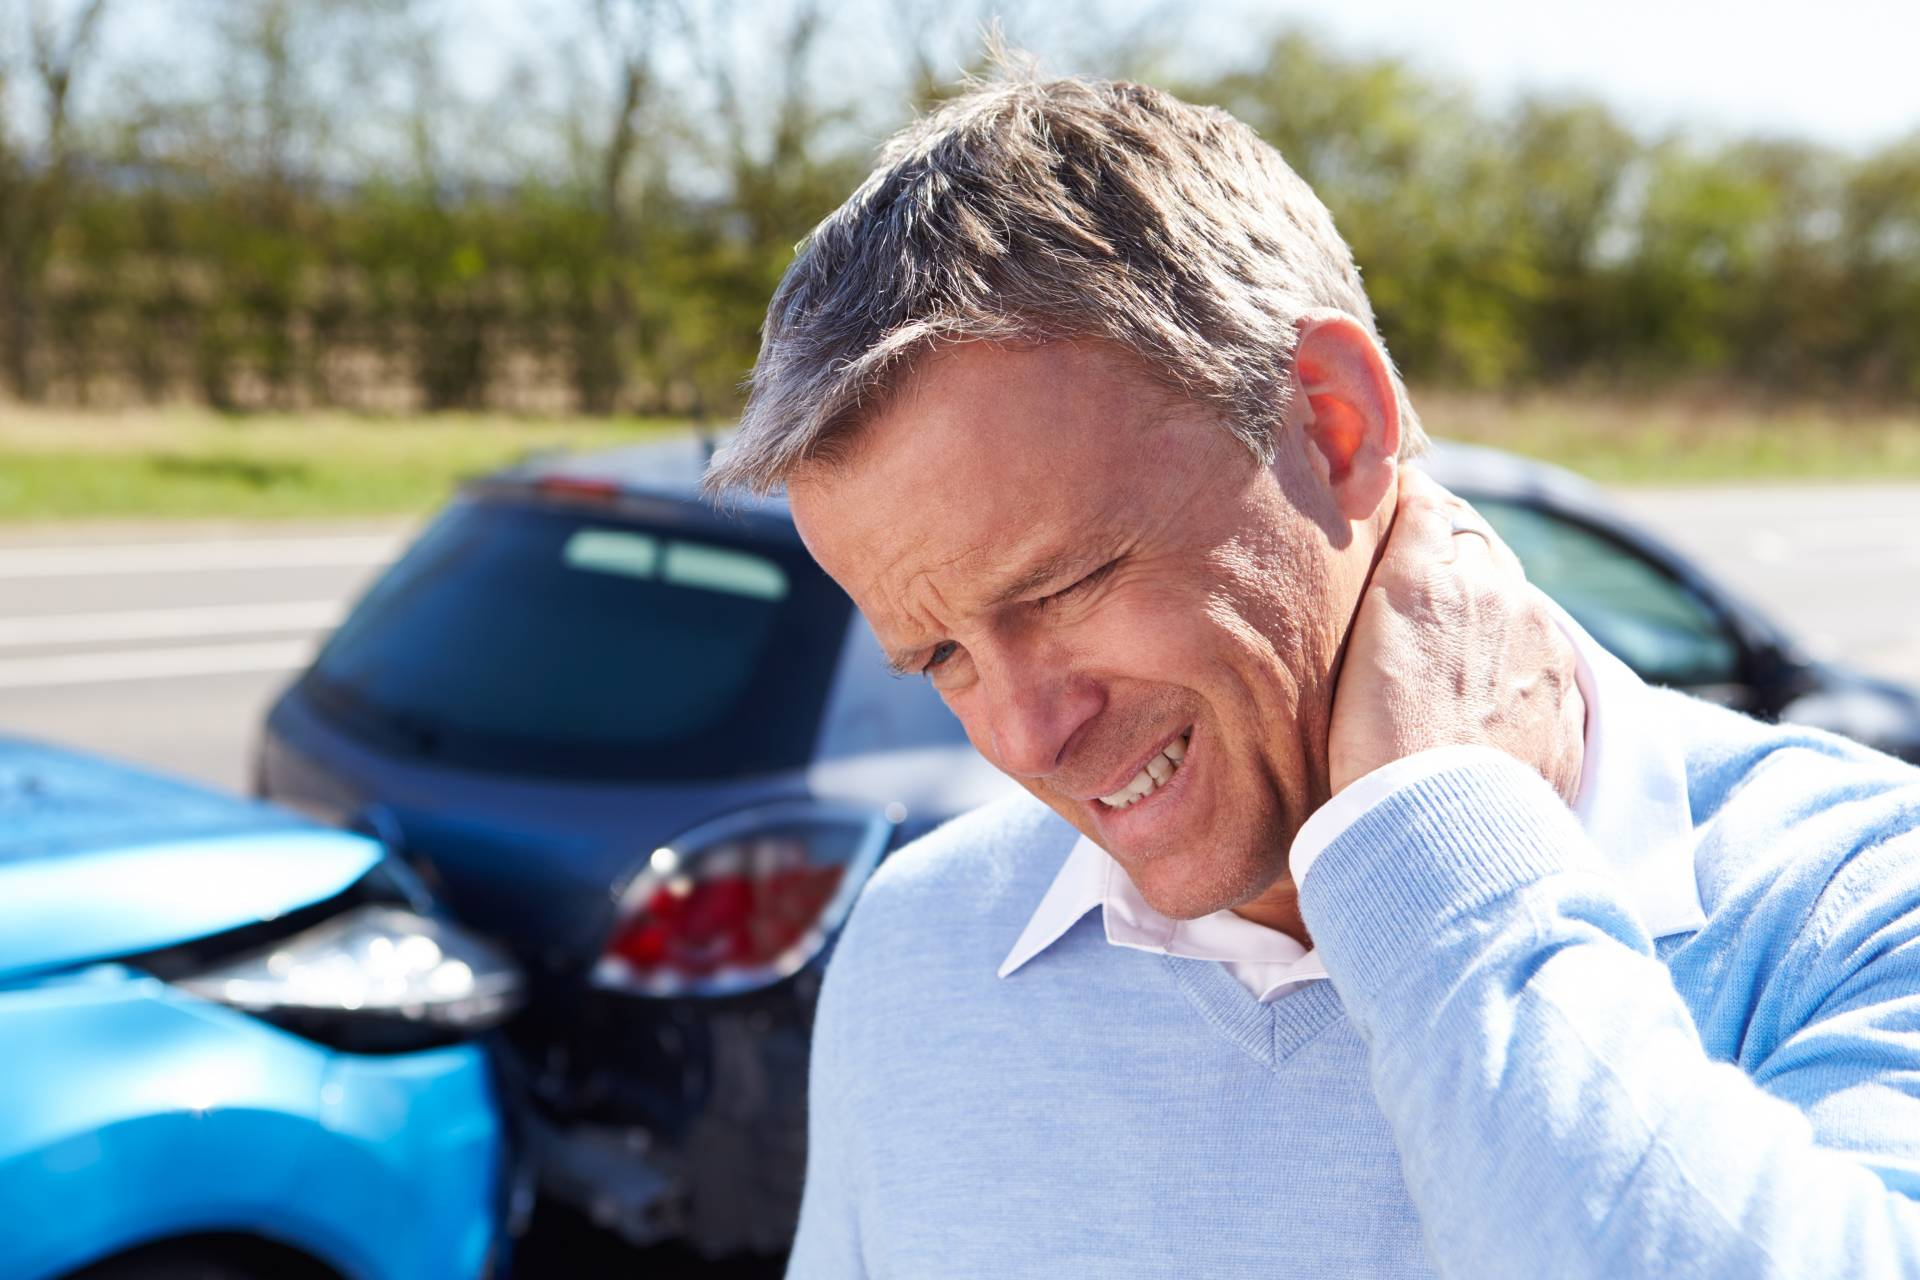 Injured in Dunwoody or Atlanta, GA? The Angell Firm is here to help.